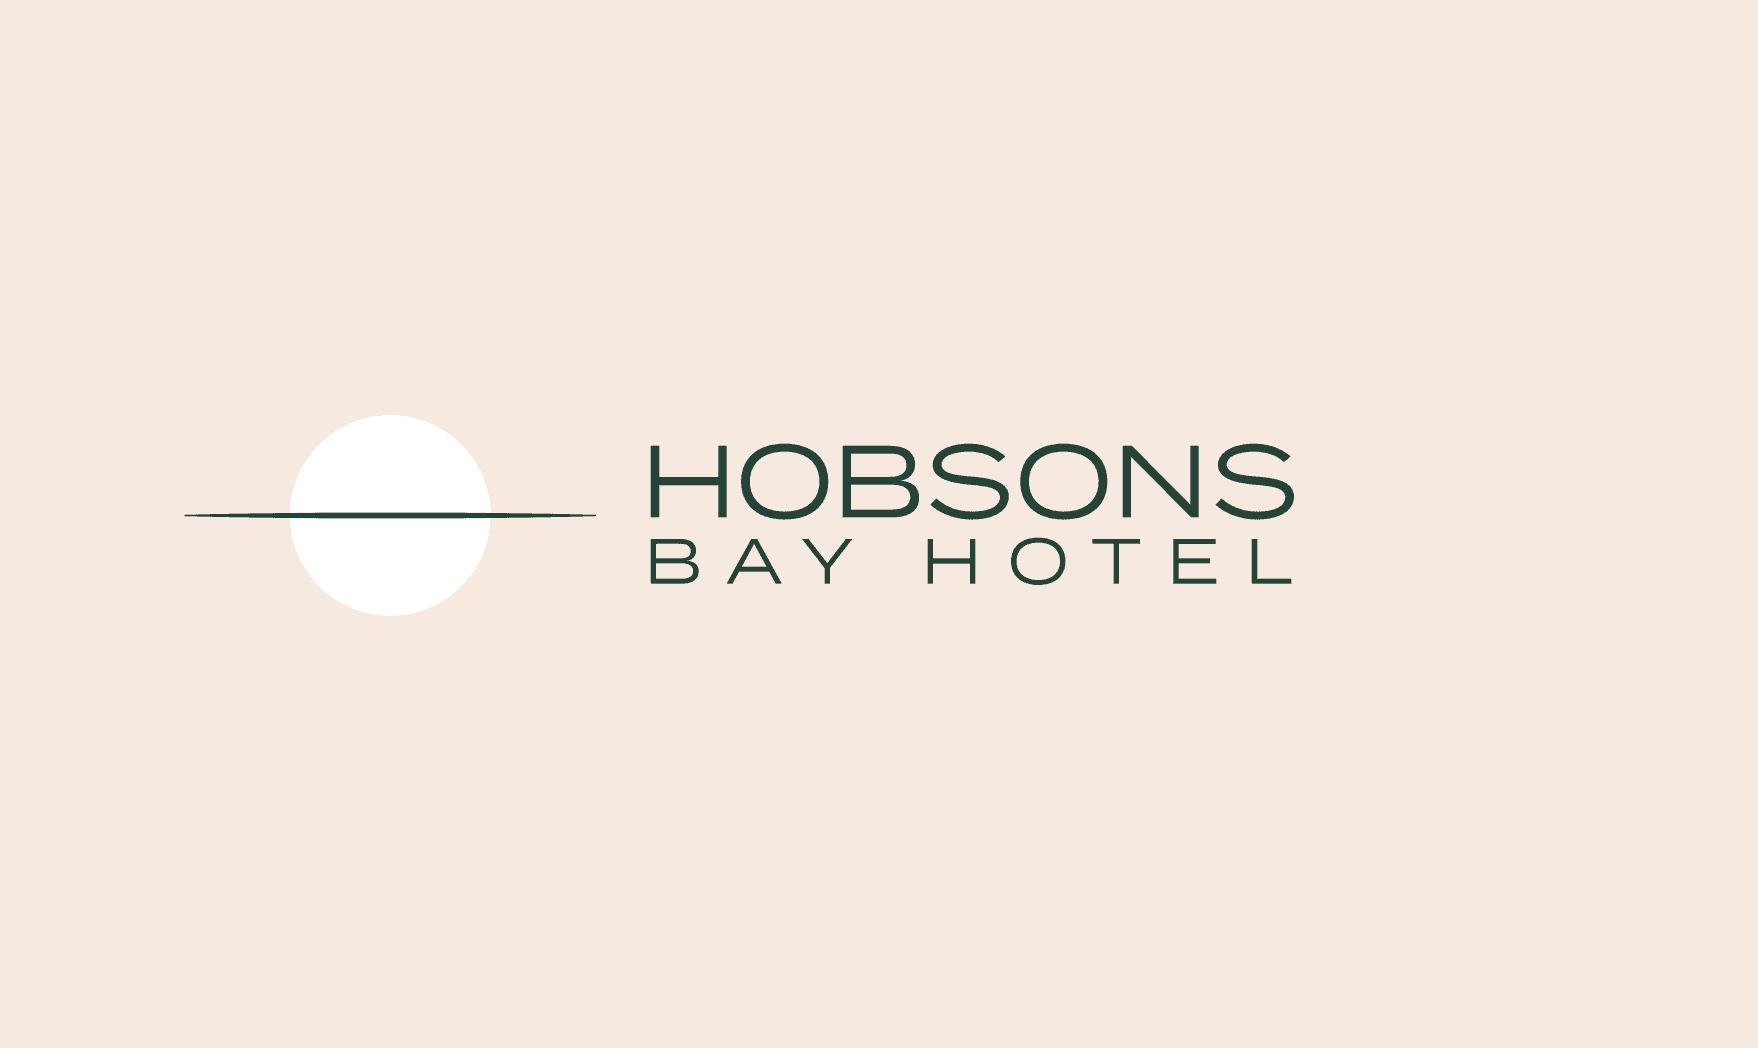 Hobsons Bay Hotel